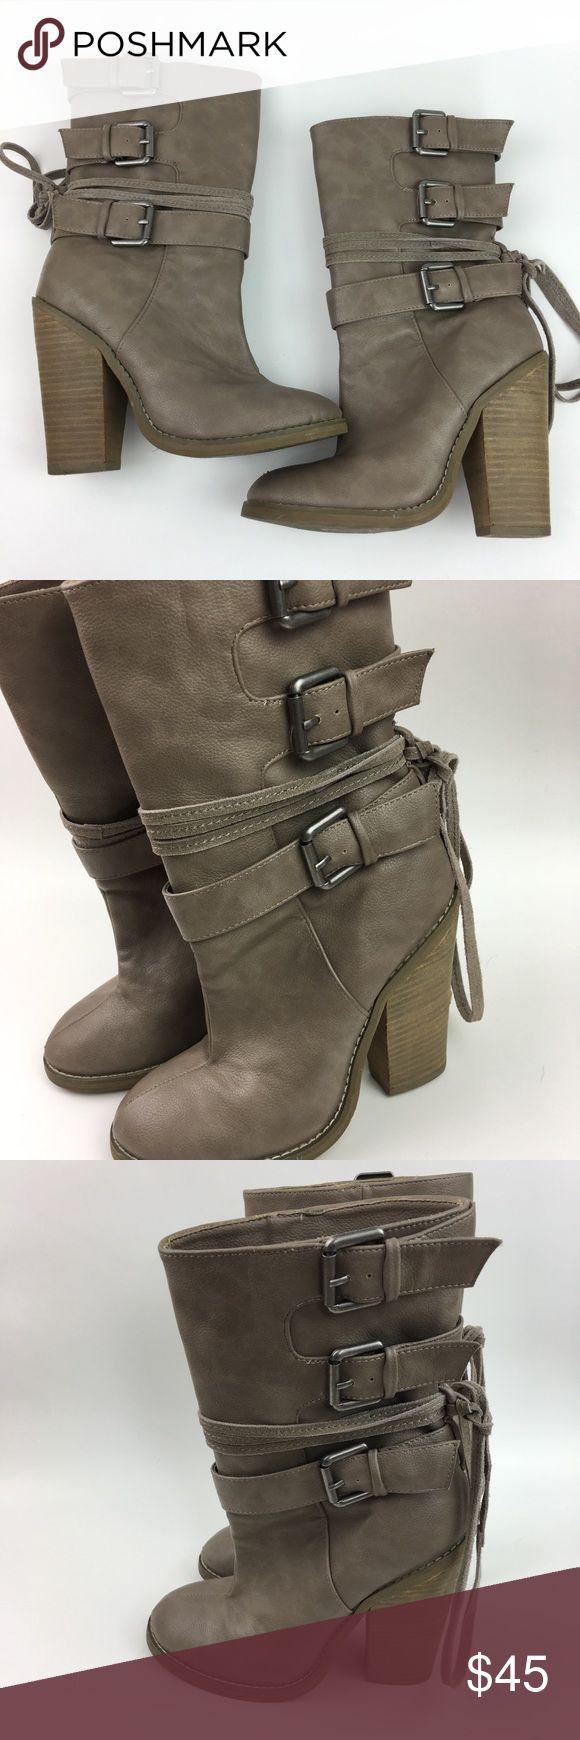 Colin Stuart Tan Heeled Boots Colin Stuart women's Tan Heeled Boots. Buckles details. Ties in back. Size 6B. Heel measures 4.5. Colin Stuart Shoes Heeled Boots